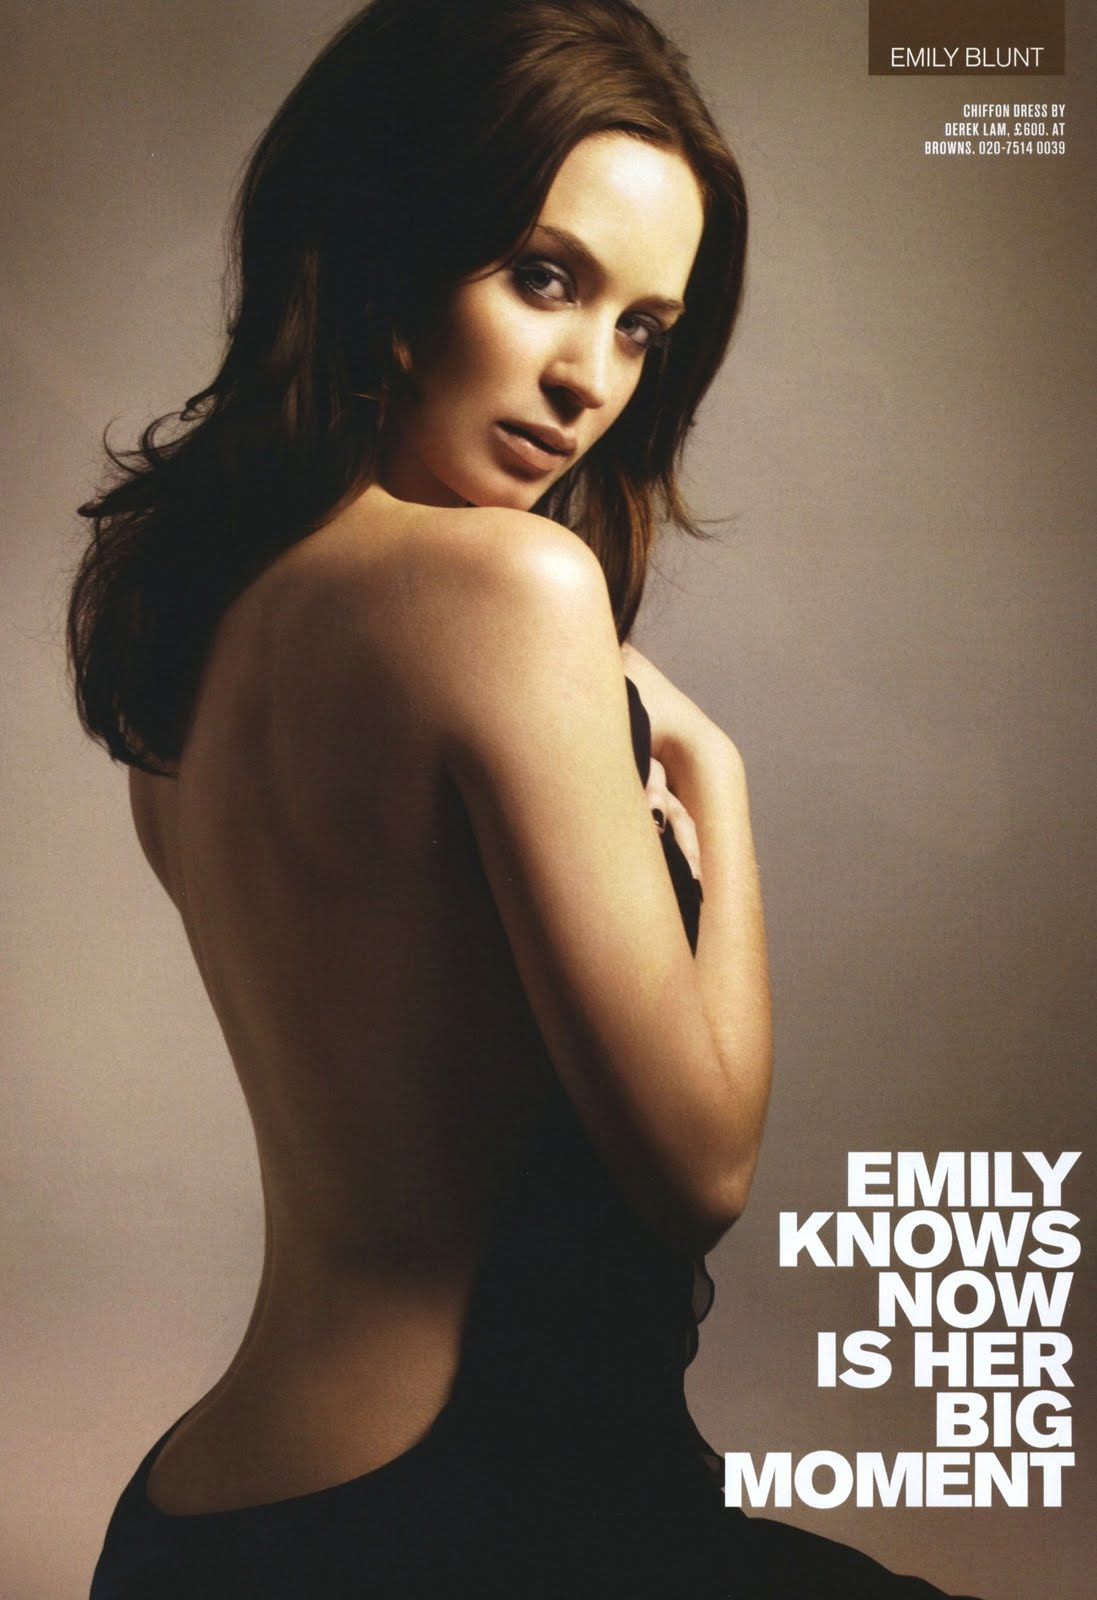 http://1.bp.blogspot.com/-K7k1C6e0874/UOzon7nKWcI/AAAAAAAAPFE/Wu5VbJJAsTs/s1600/Emily-Blunt-04.jpg